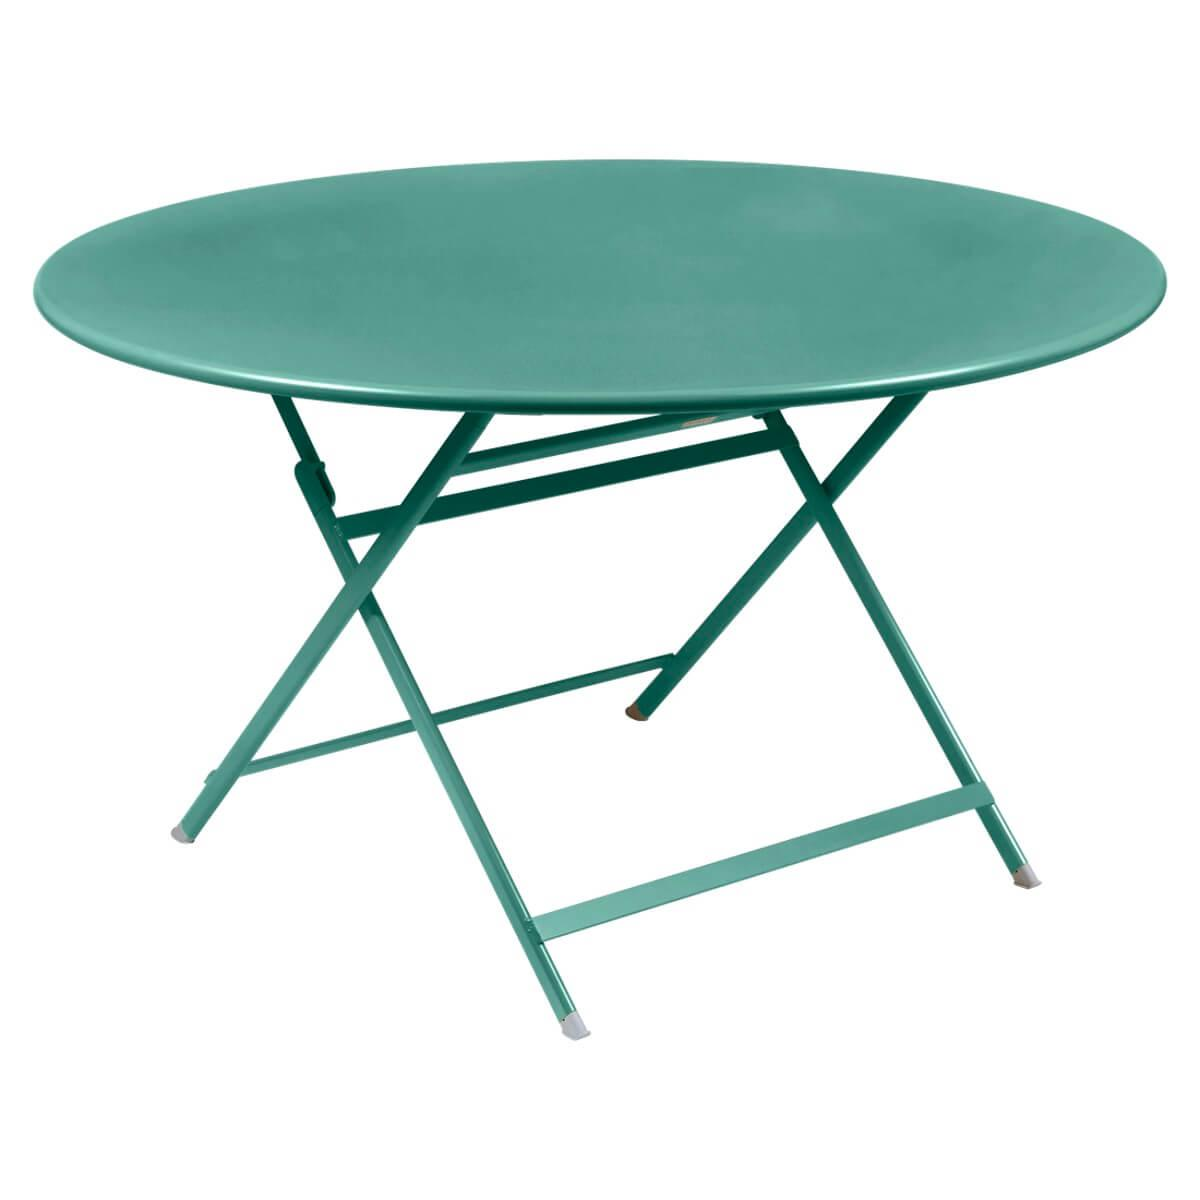 Table ronde 128cm CARACTERE Fermob bleu lagune